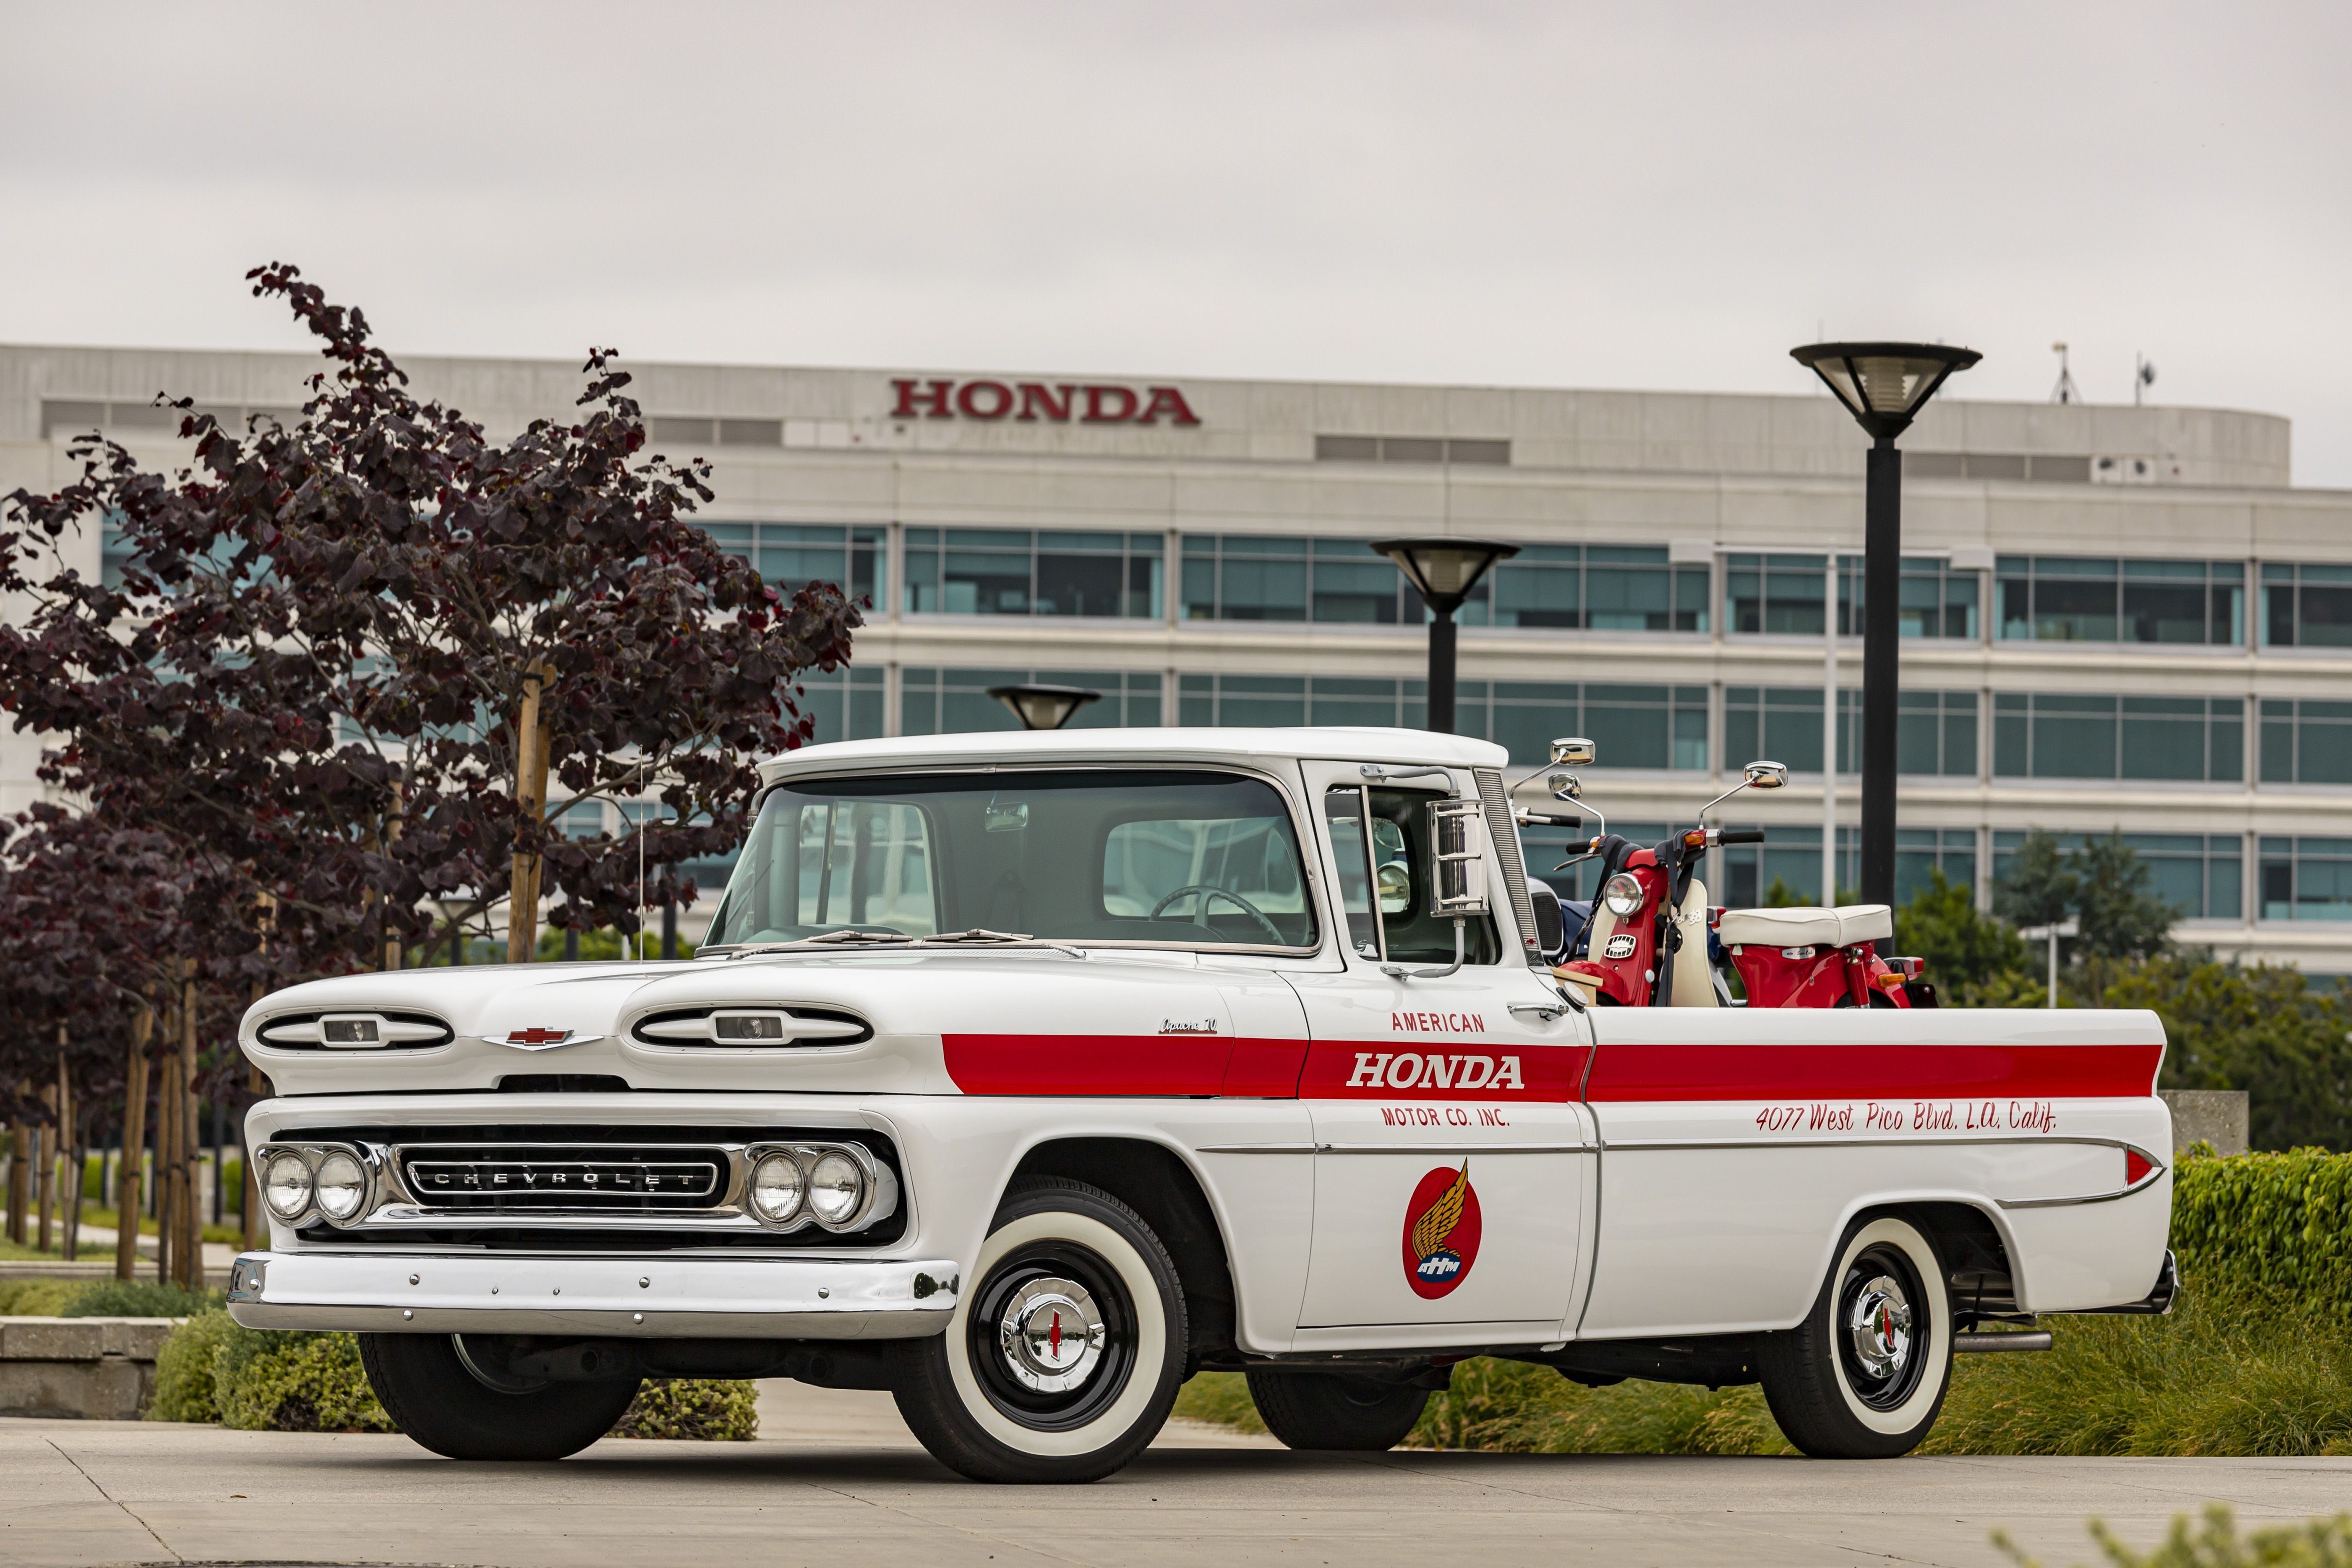 Zanimljivost dana: Honda restaurirala klasični Chevroletov pikap